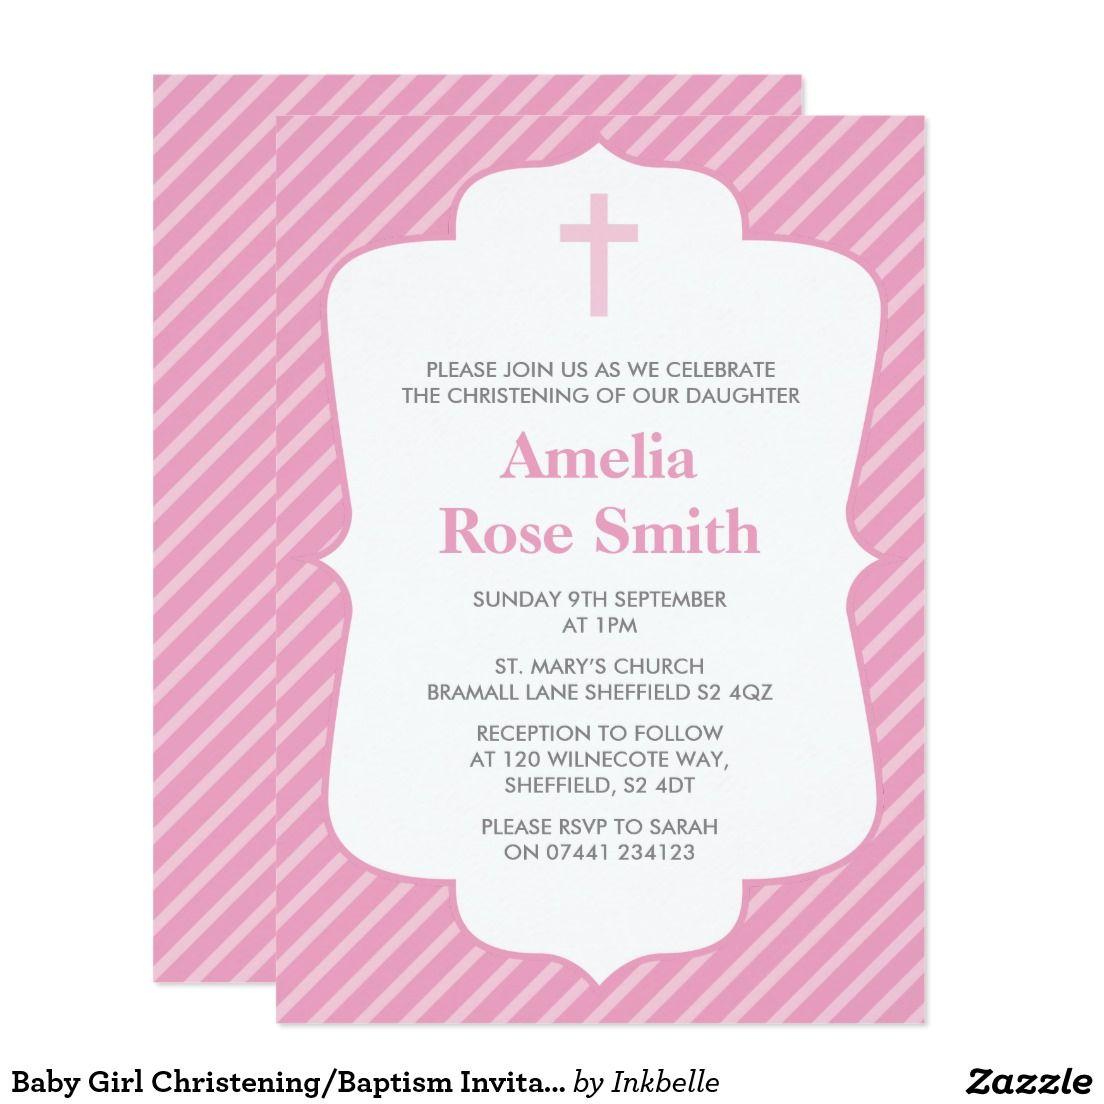 Baby Girl Christening/Baptism Invitation | Baptism invitations